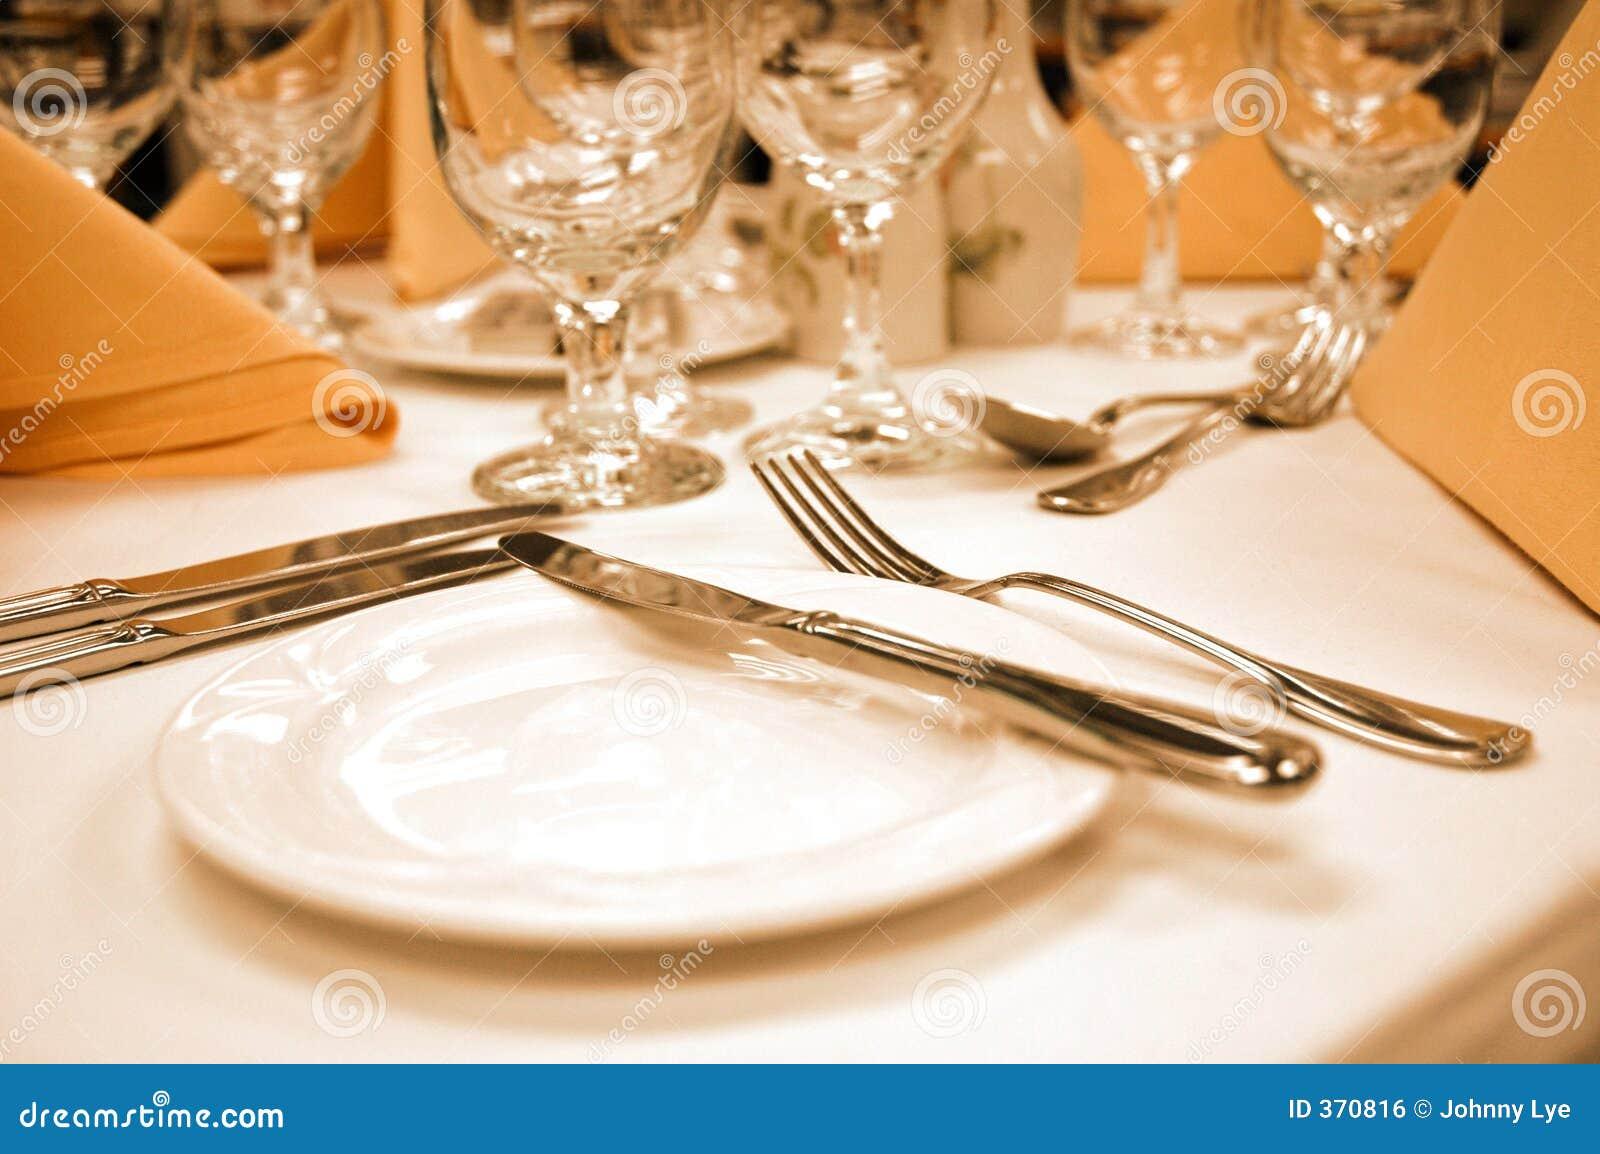 Formal Dinner Setting Bread Plate Royalty Free Stock